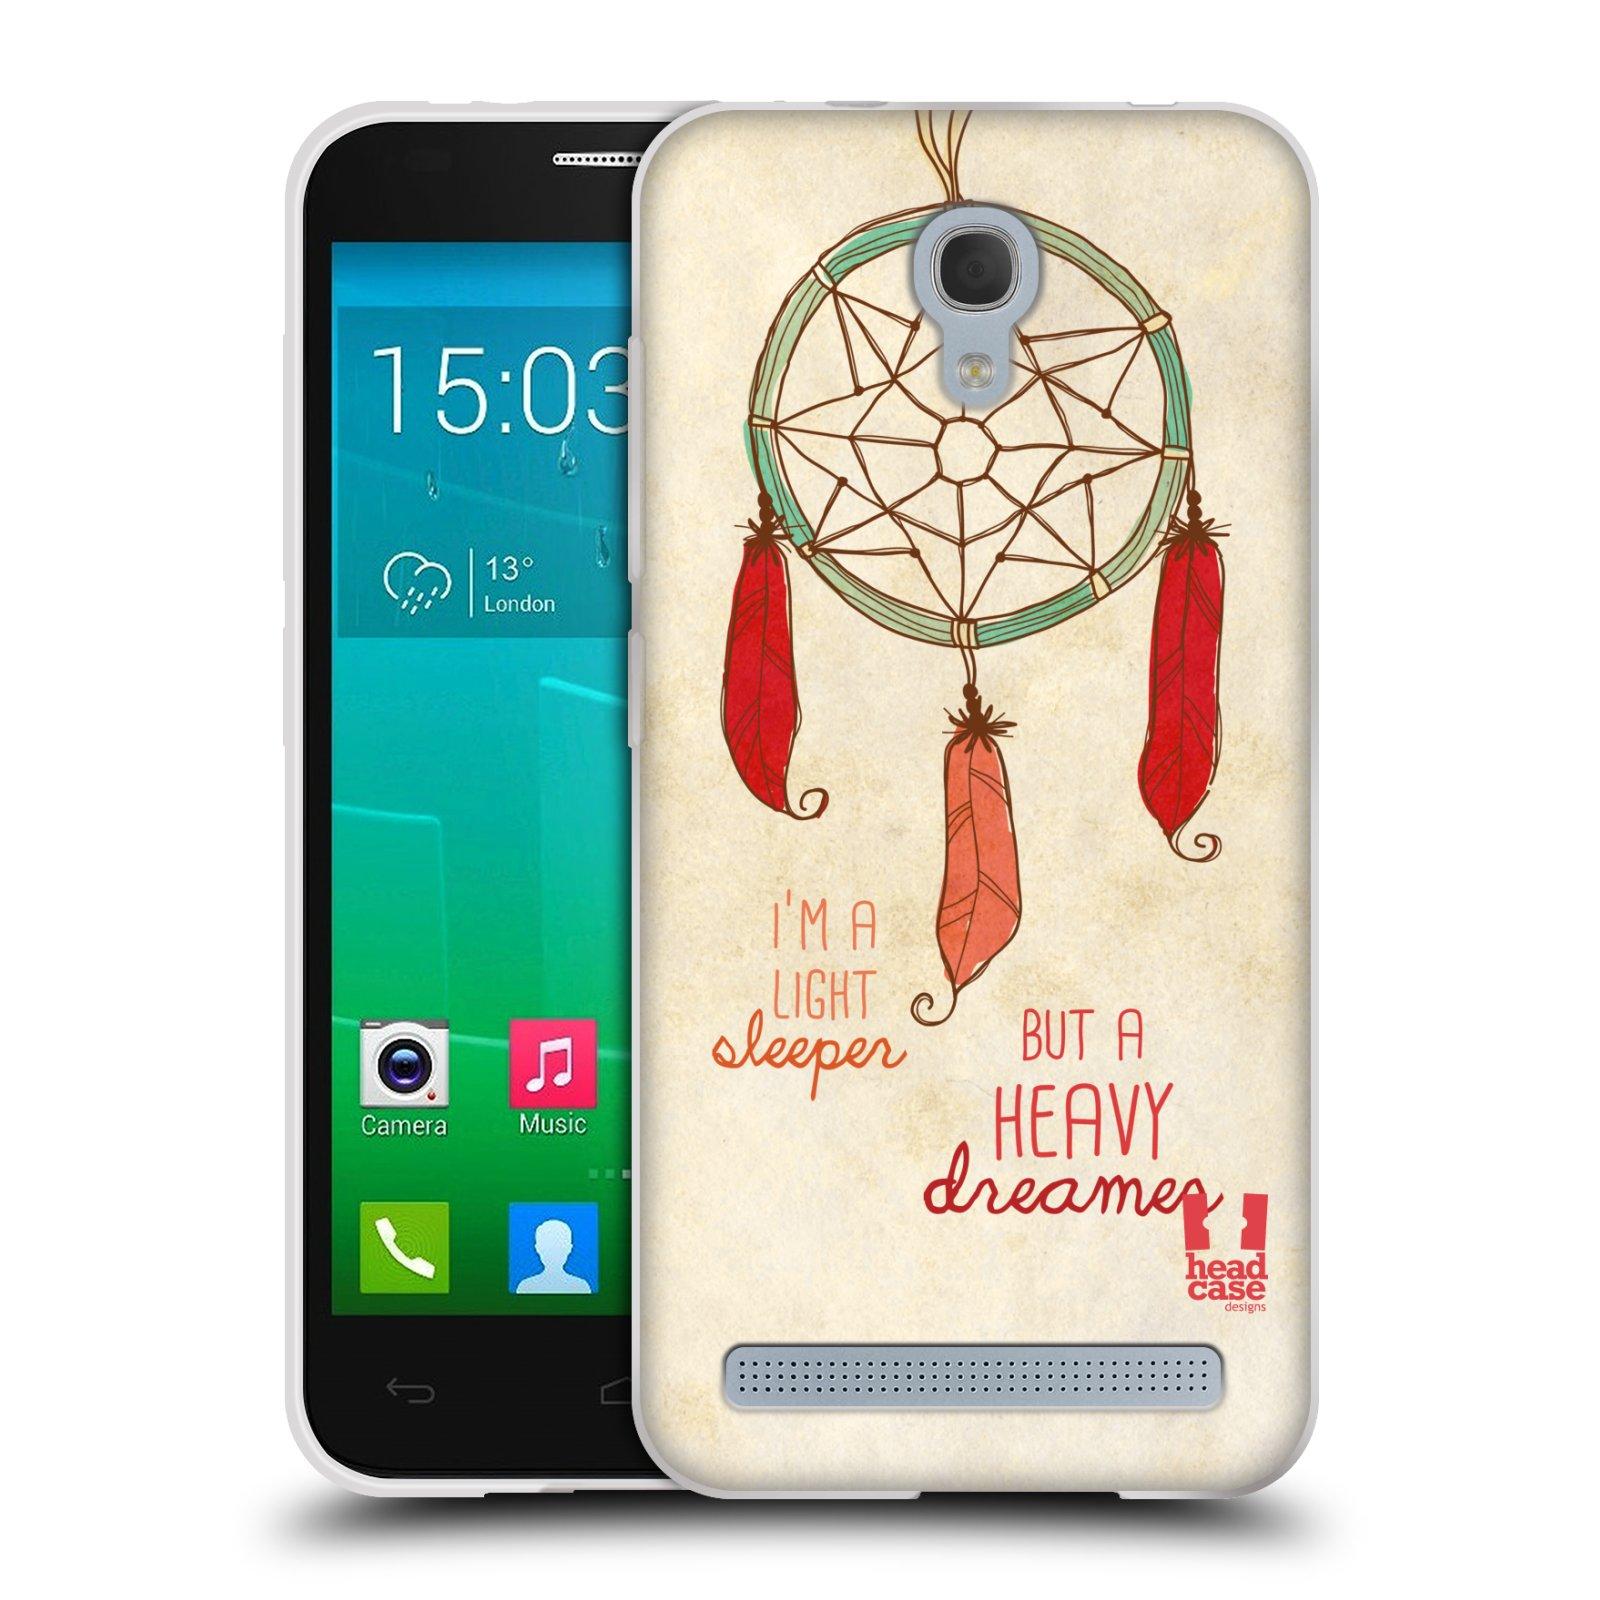 Silikonové pouzdro na mobil Alcatel One Touch Idol 2 Mini S 6036Y HEAD CASE LAPAČ HEAVY DREAMER (Silikonový kryt či obal na mobilní telefon Alcatel Idol 2 Mini S OT-6036Y)